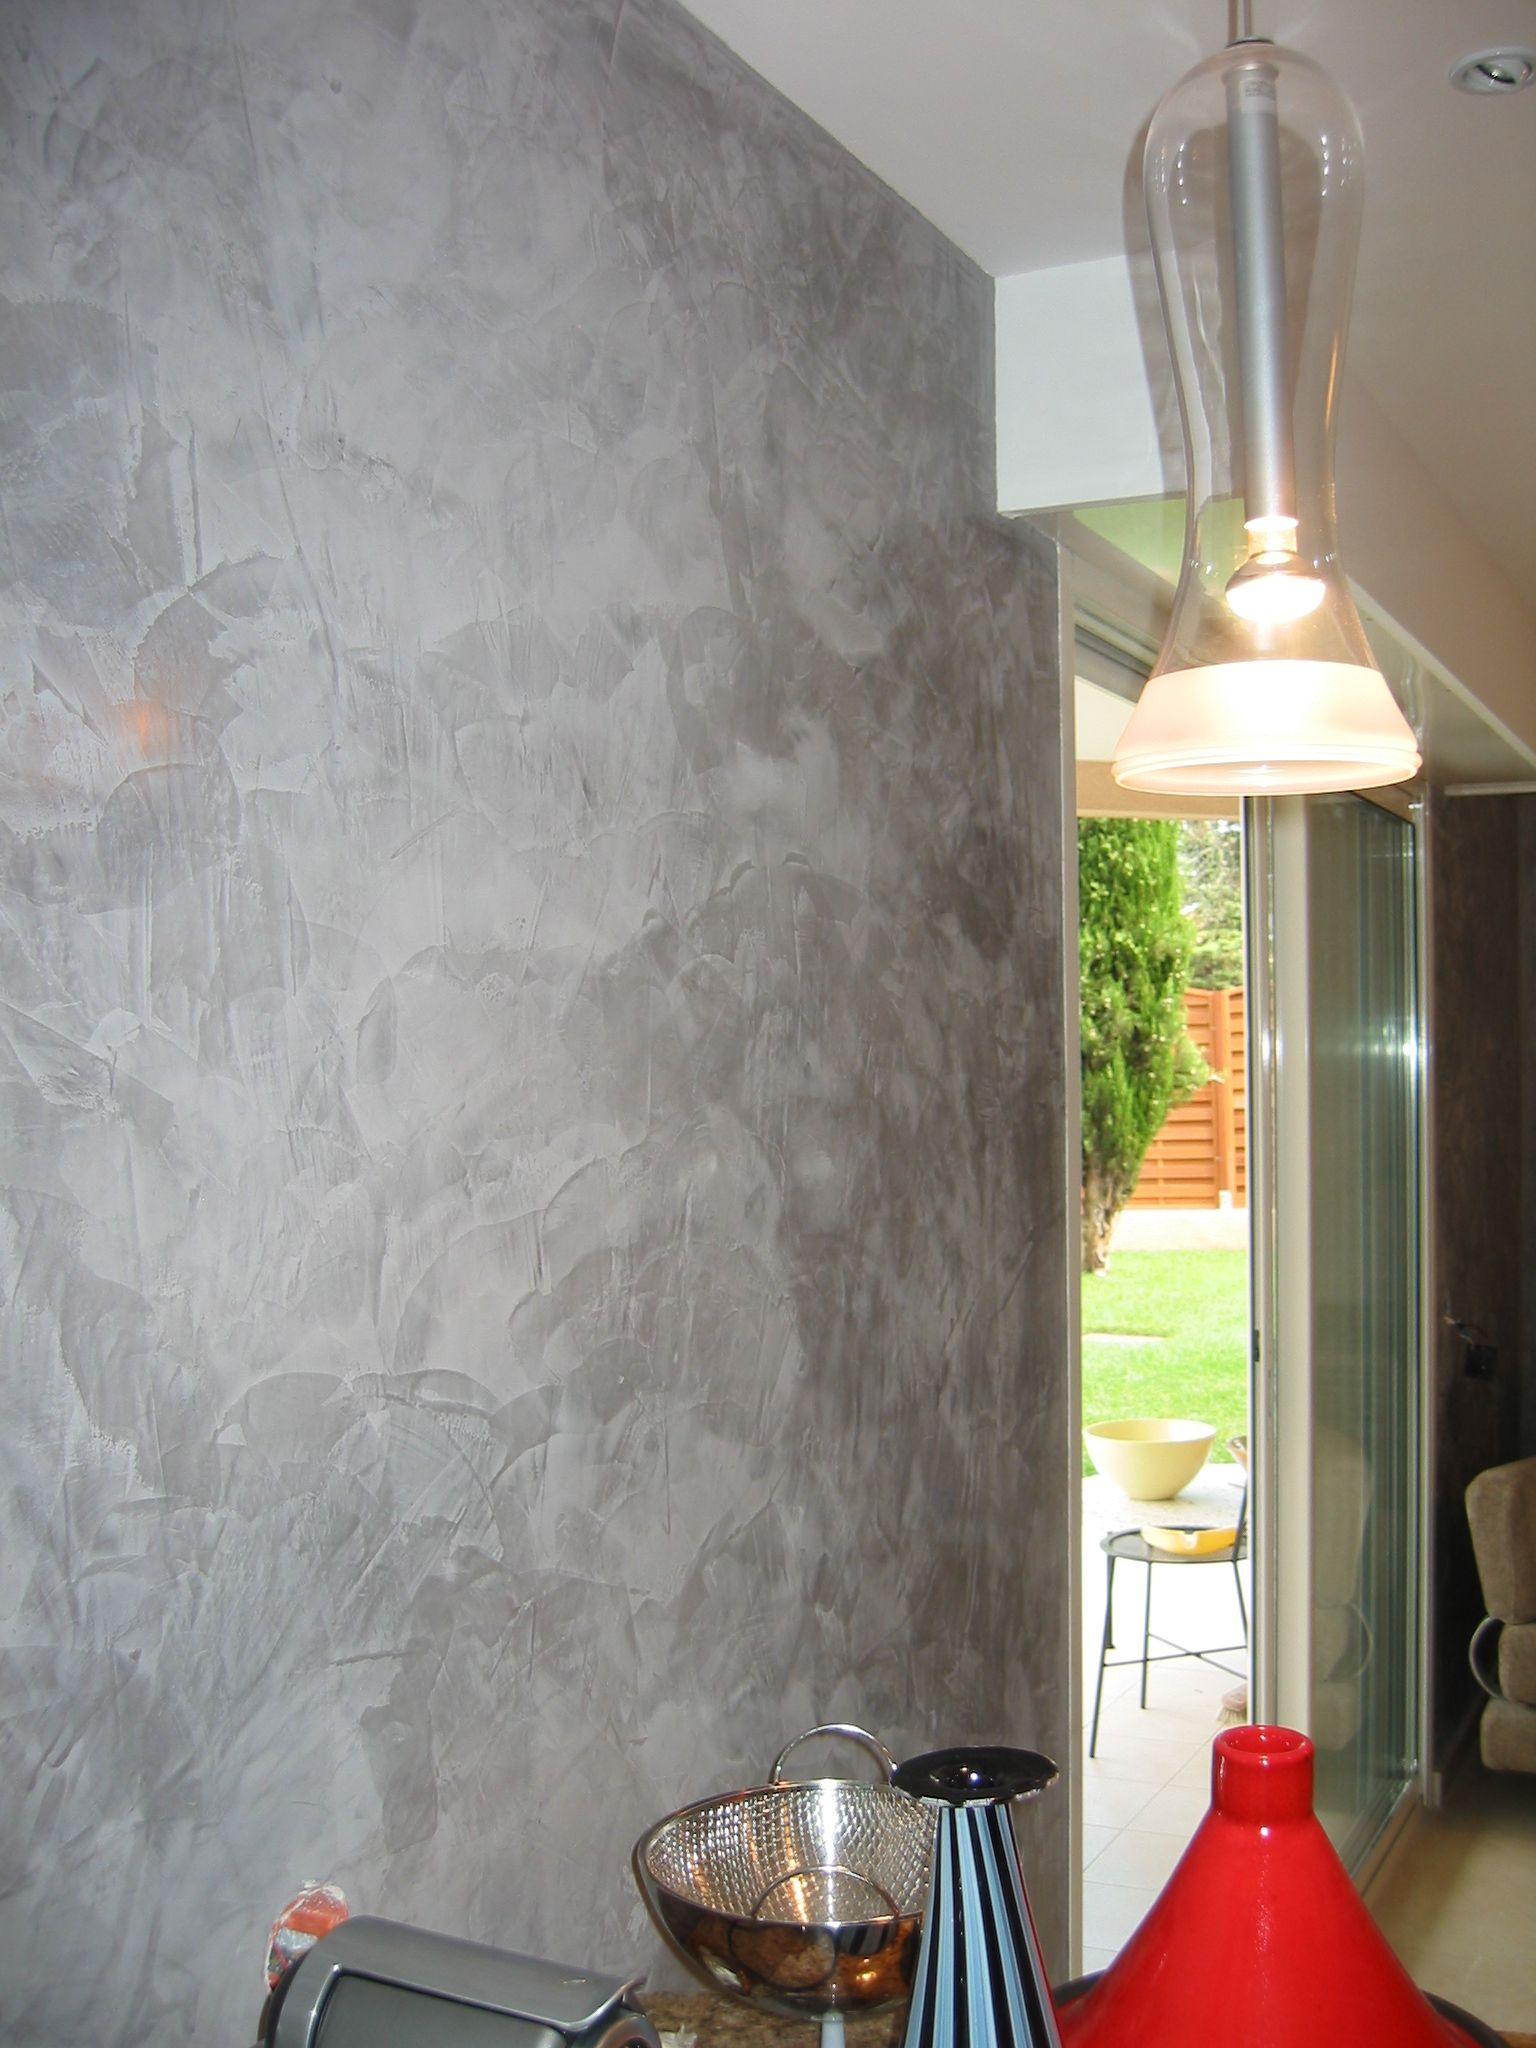 This stays - medium grey Venetian plaster on the far wall.